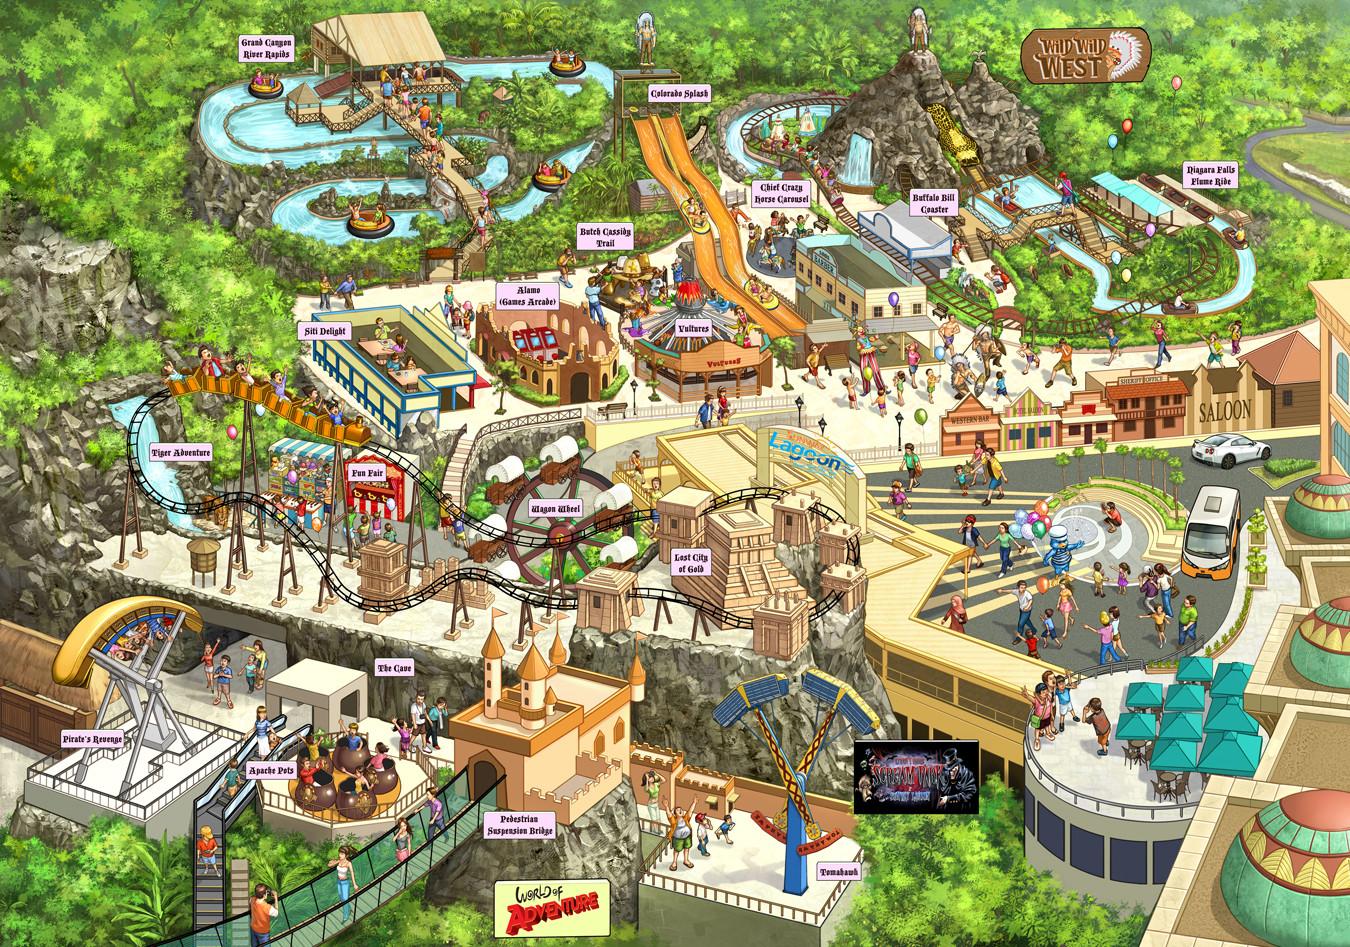 Kinsun loh sunway adventure map